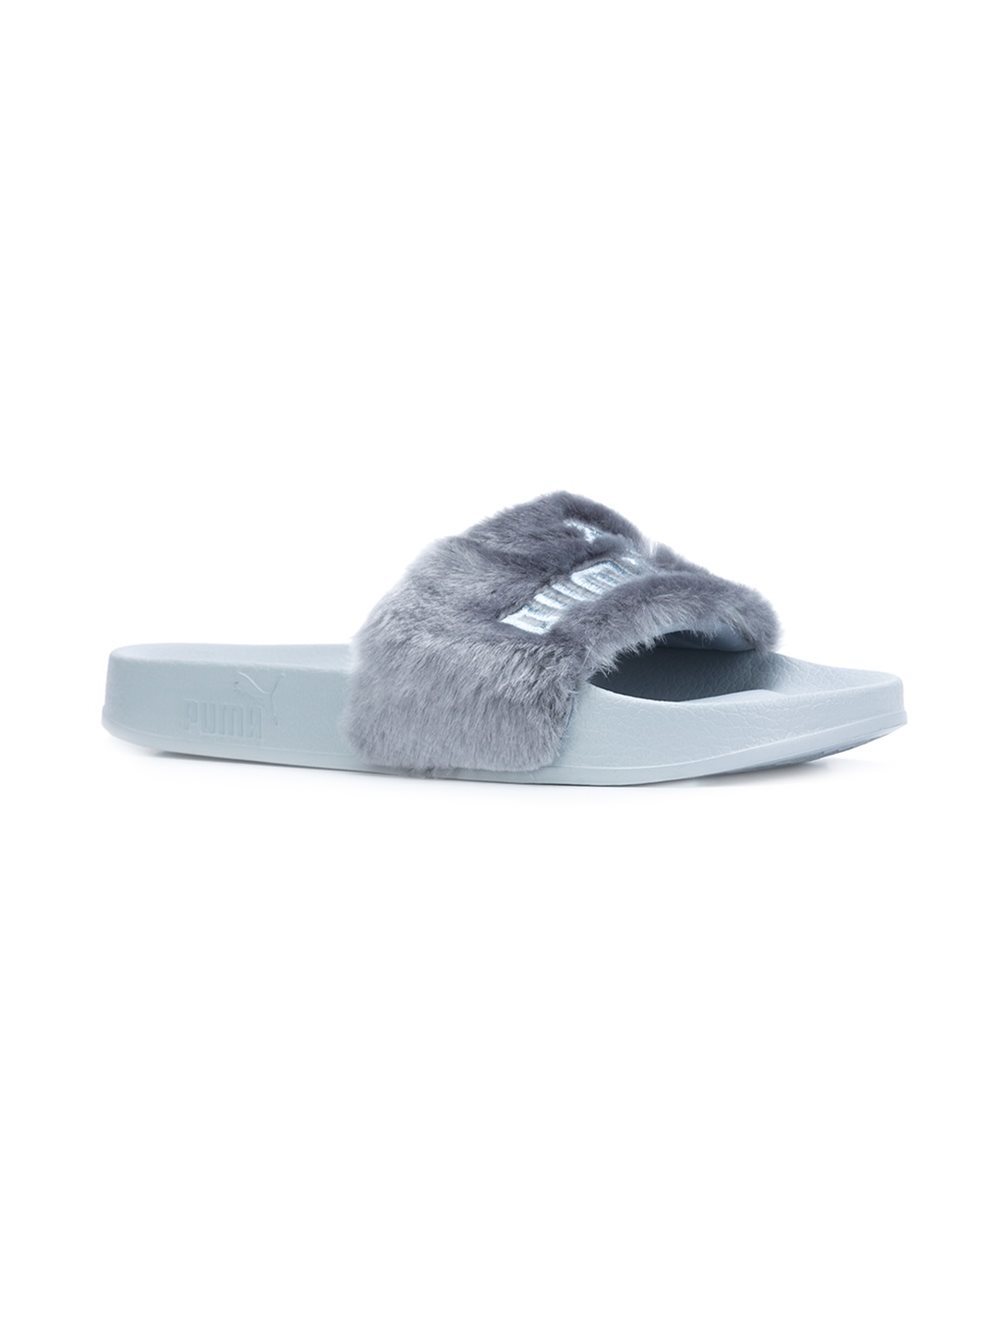 Puma Fur Slide Sandals In Gray Lyst